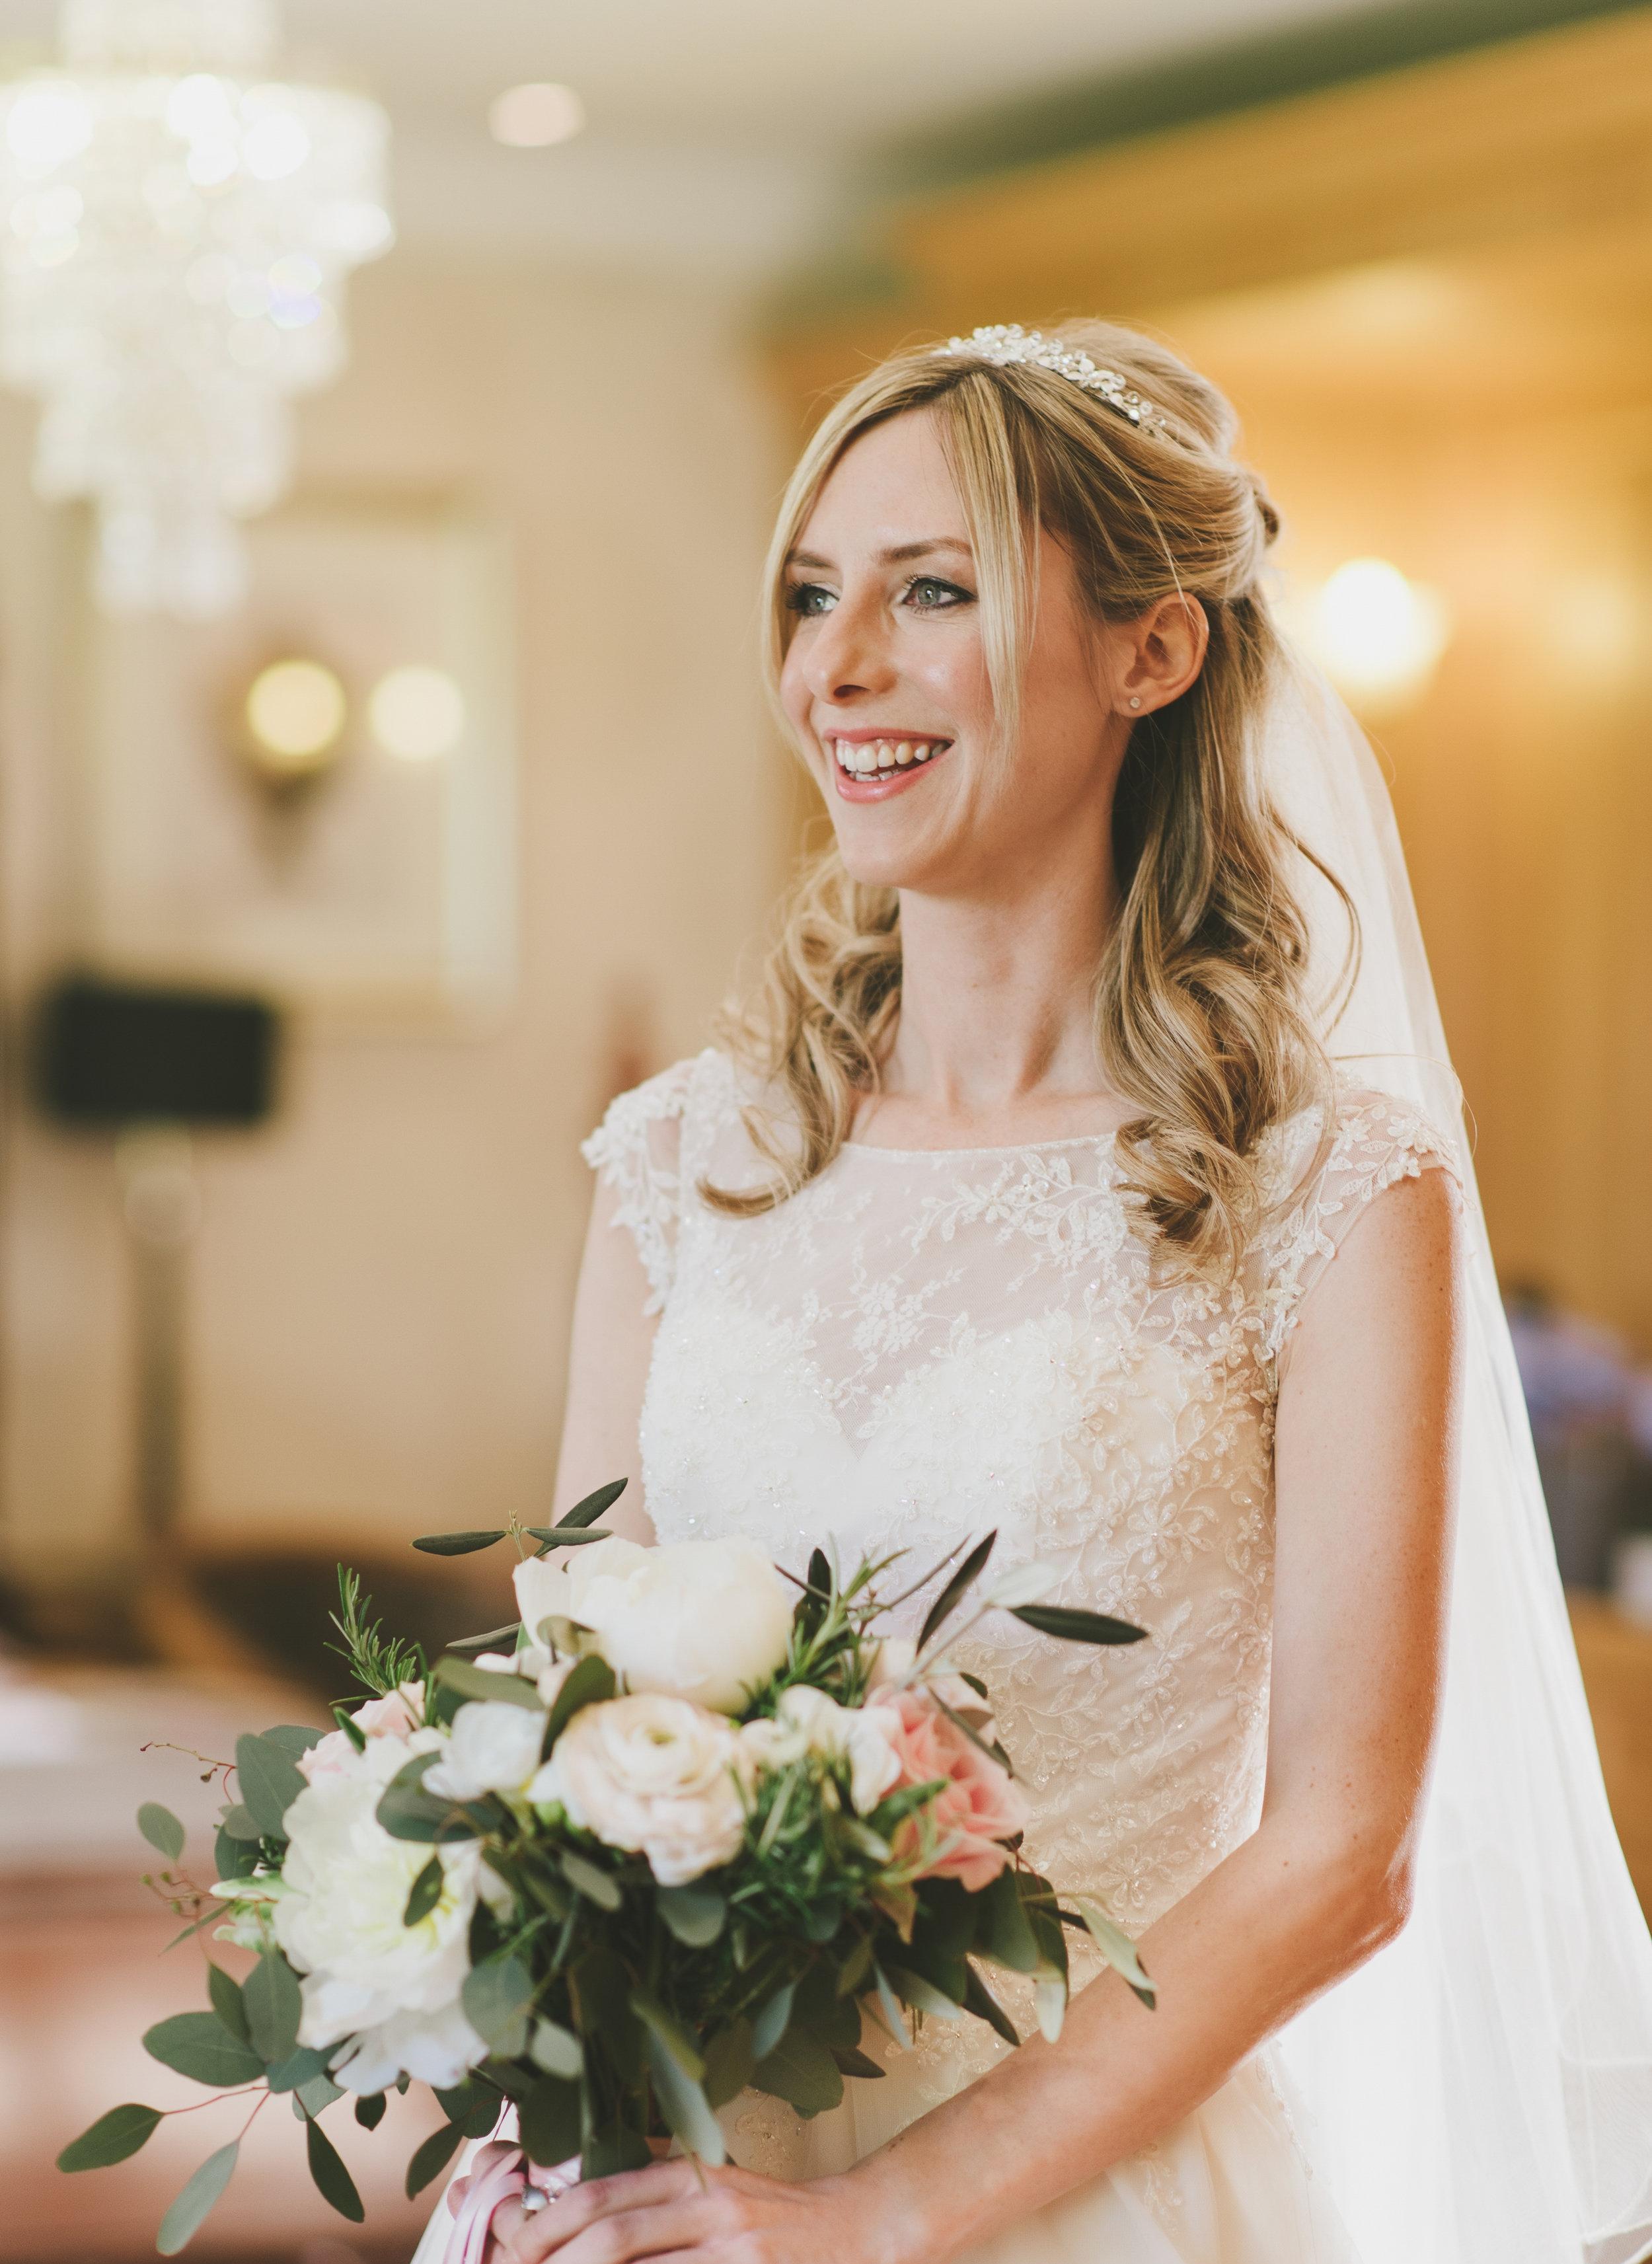 Sarah Jinks real bridal makeup image.jpg